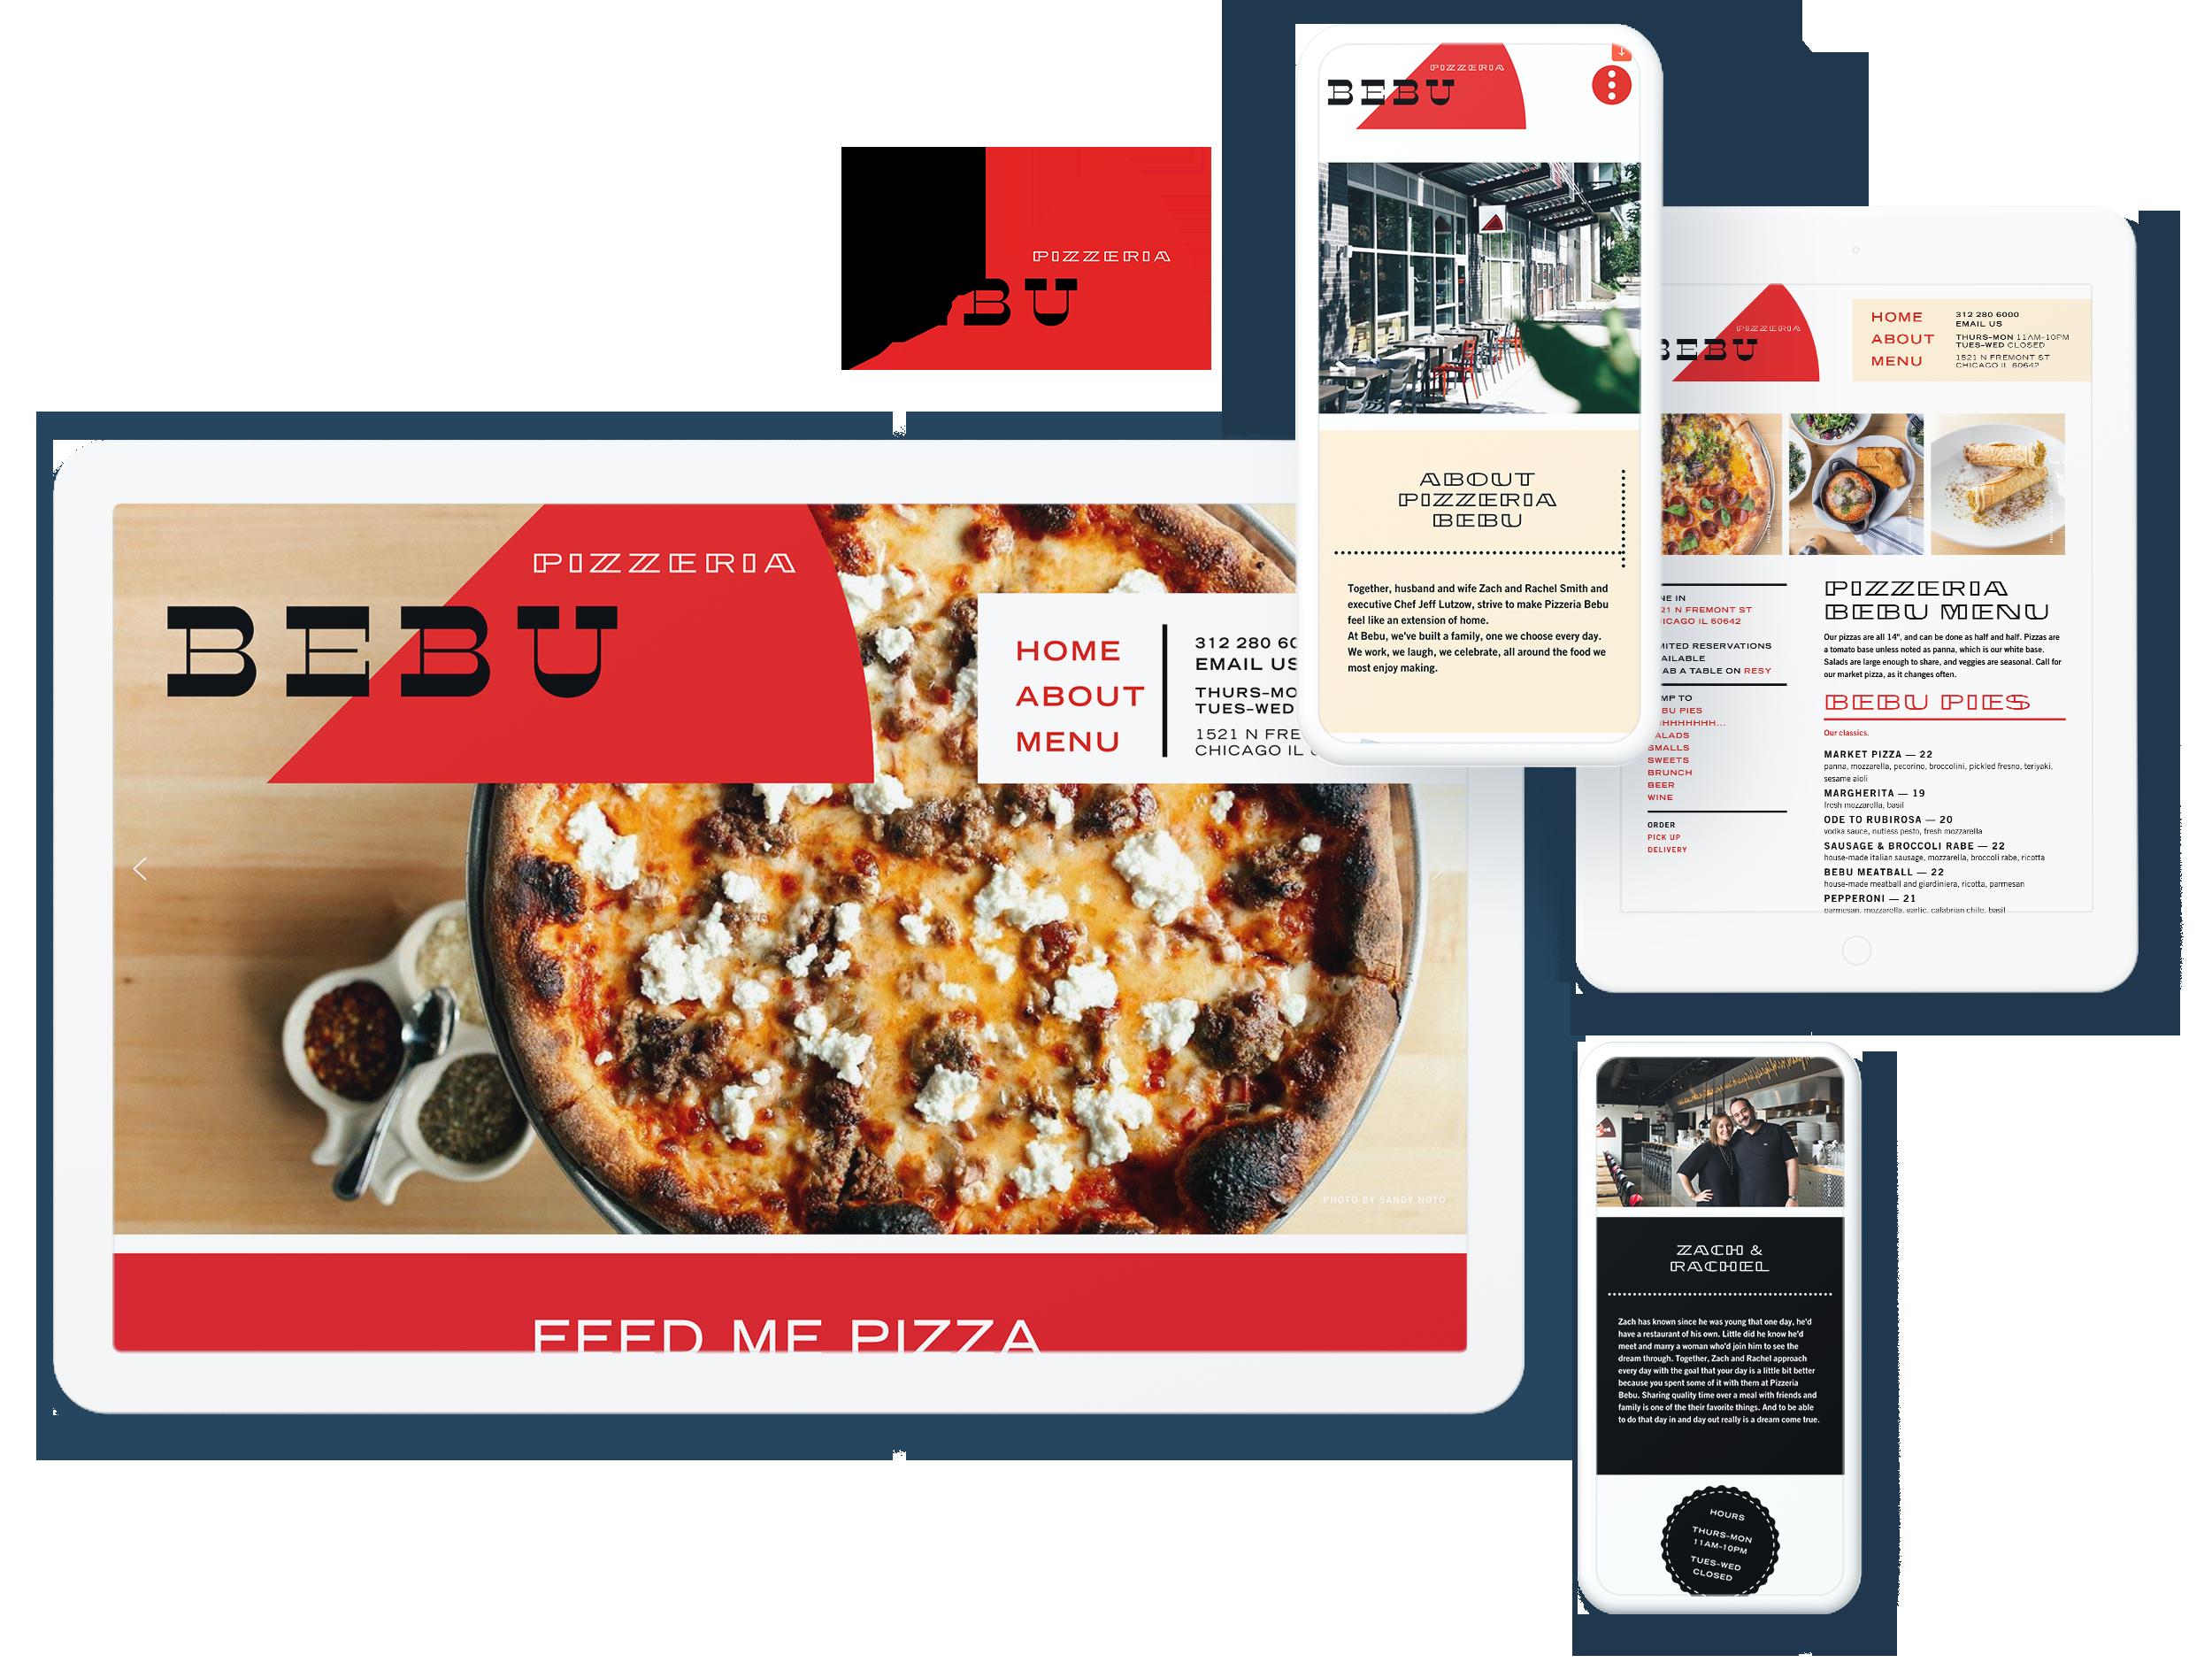 pizza bebu screens